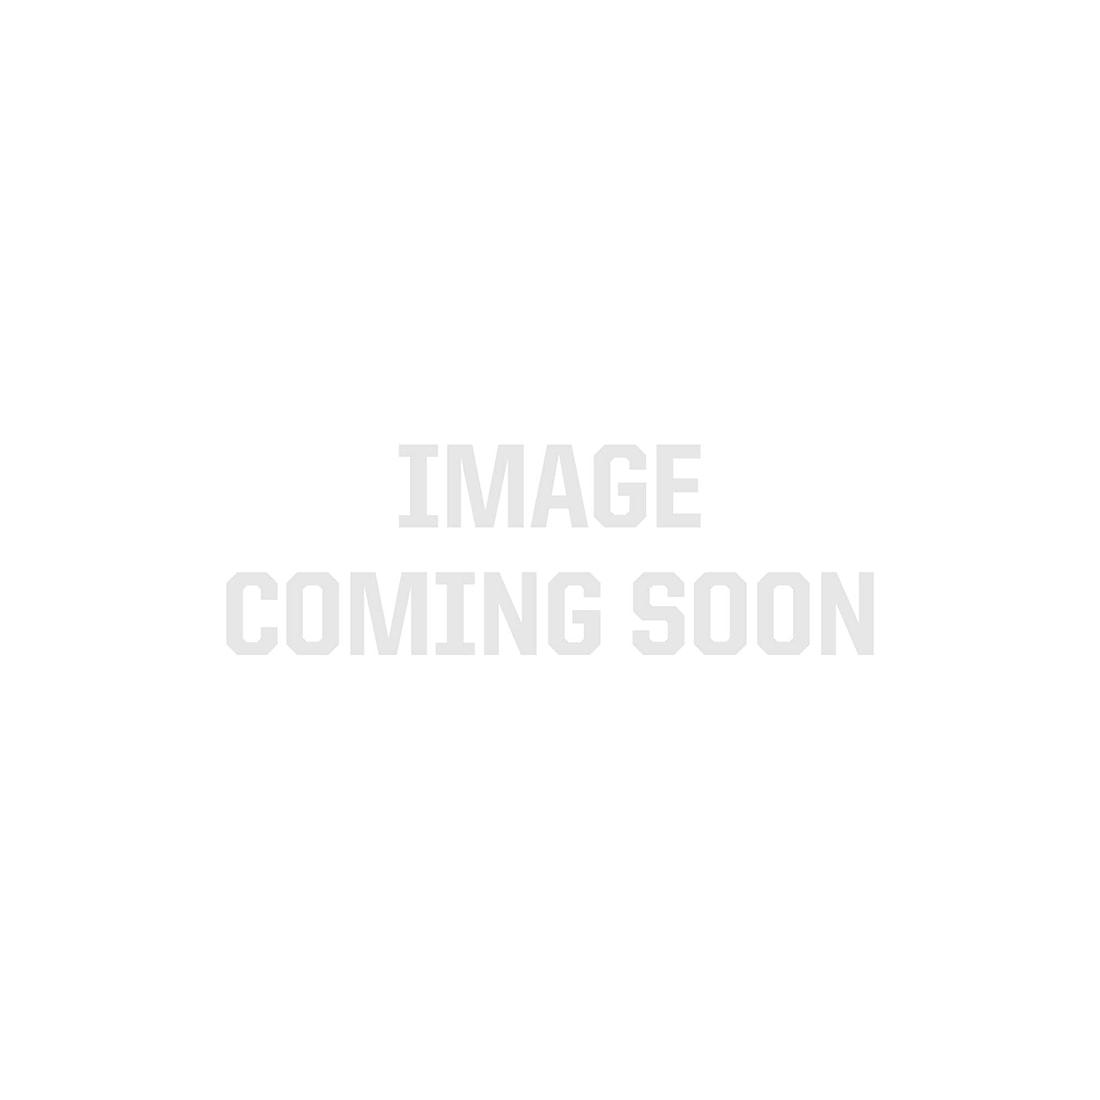 Waterproof RGB 5050 Single Row CurrentControl LED Strip Light, 60/m, 12mm wide, Sample Kit